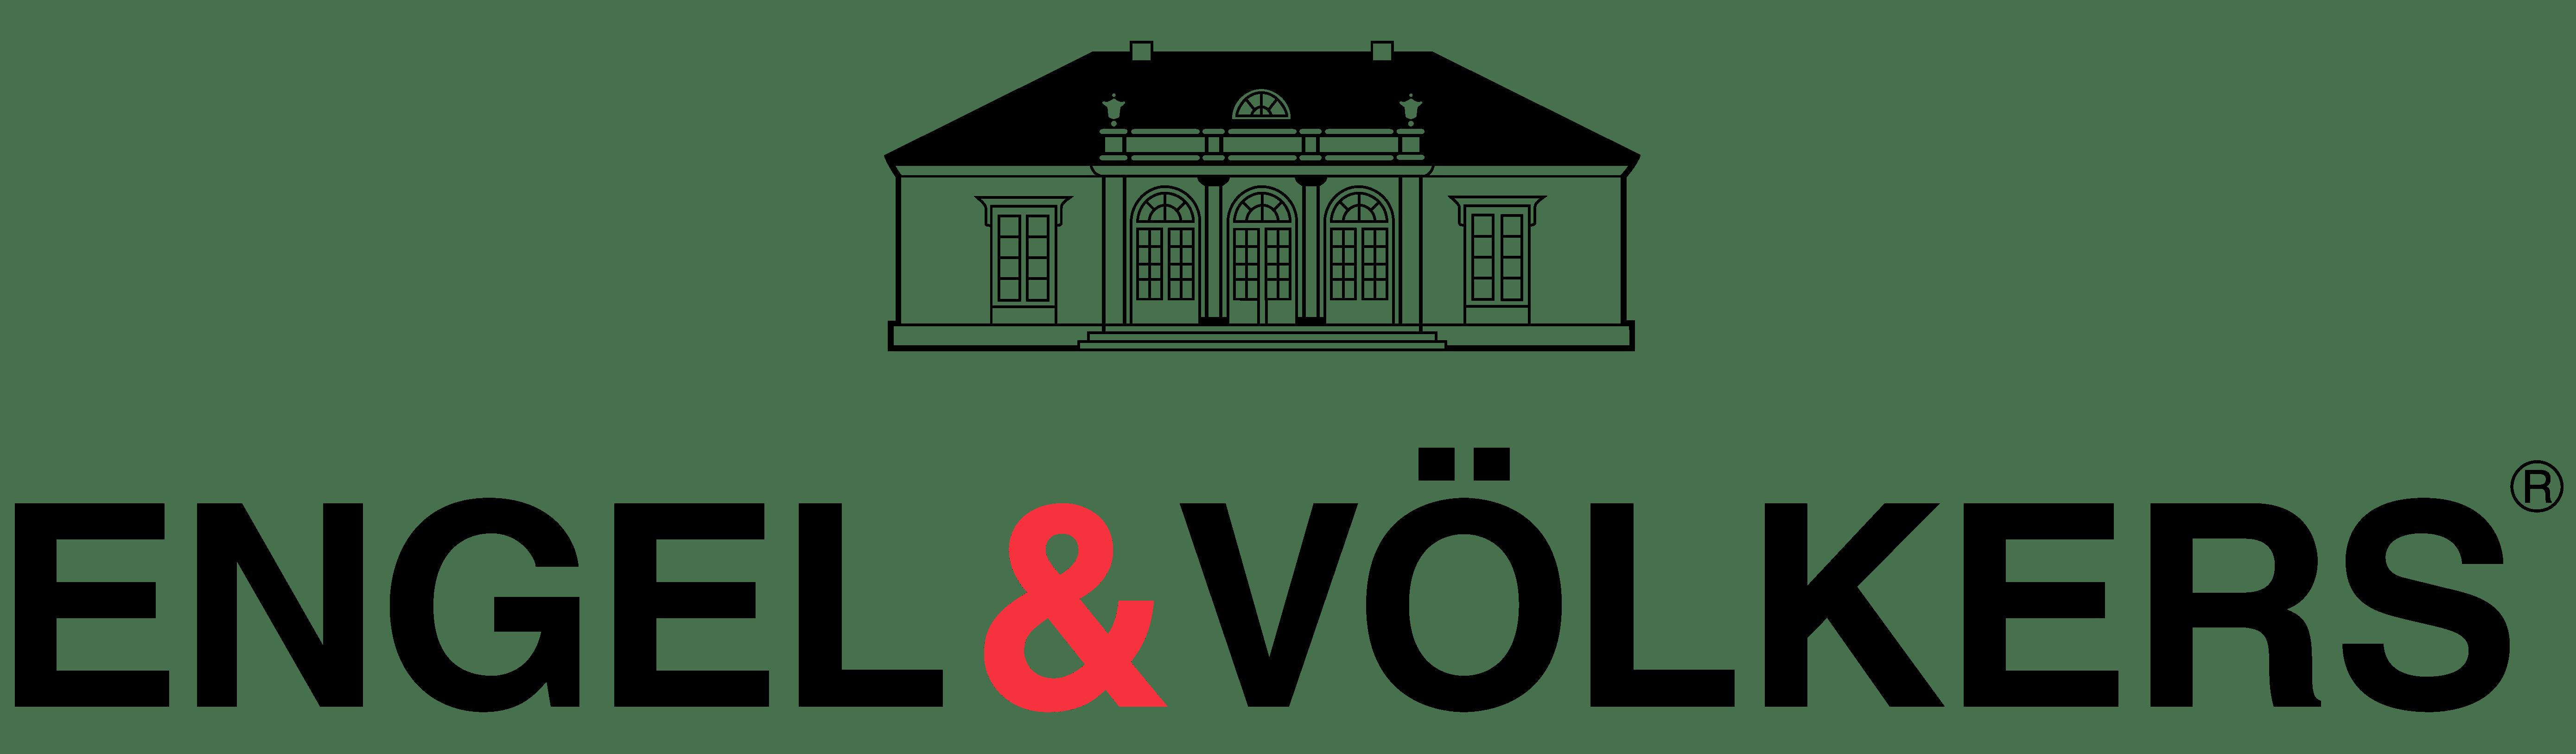 Engel & Voelkers company logo